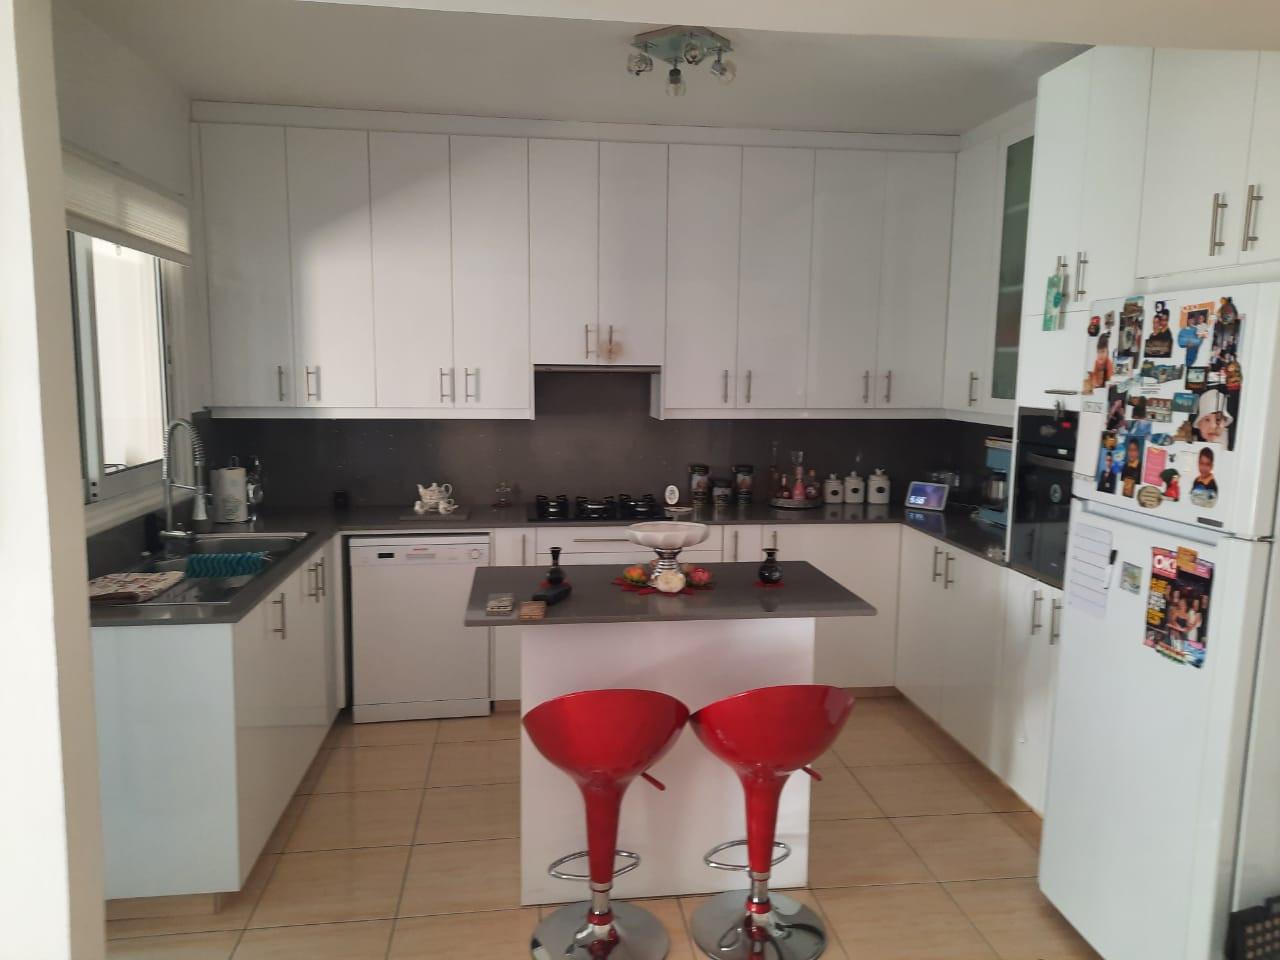 FC-33497: Apartment (Flat) in Mackenzie, Larnaca for Sale - #1